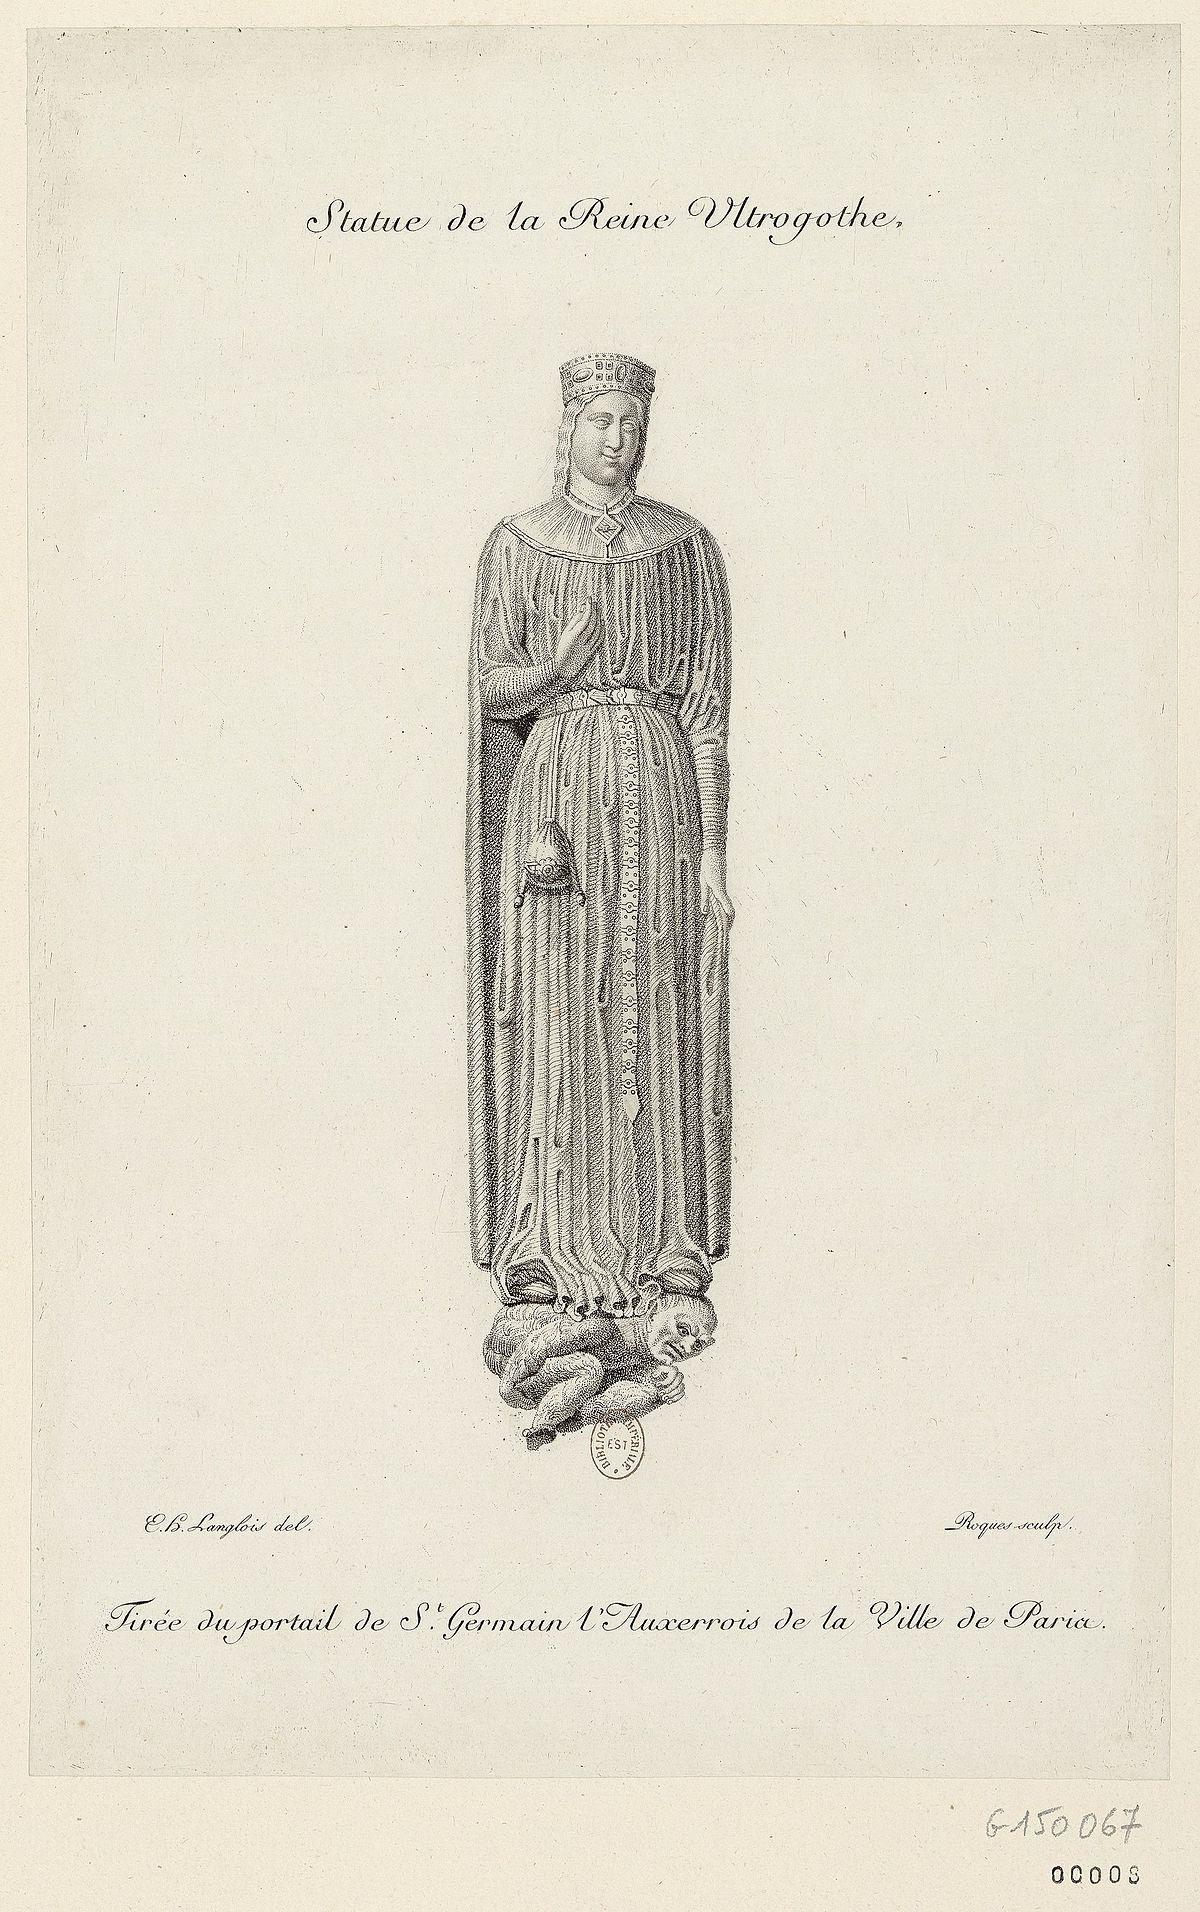 Ultrogothe wikip dia for La quincaillerie saint germain